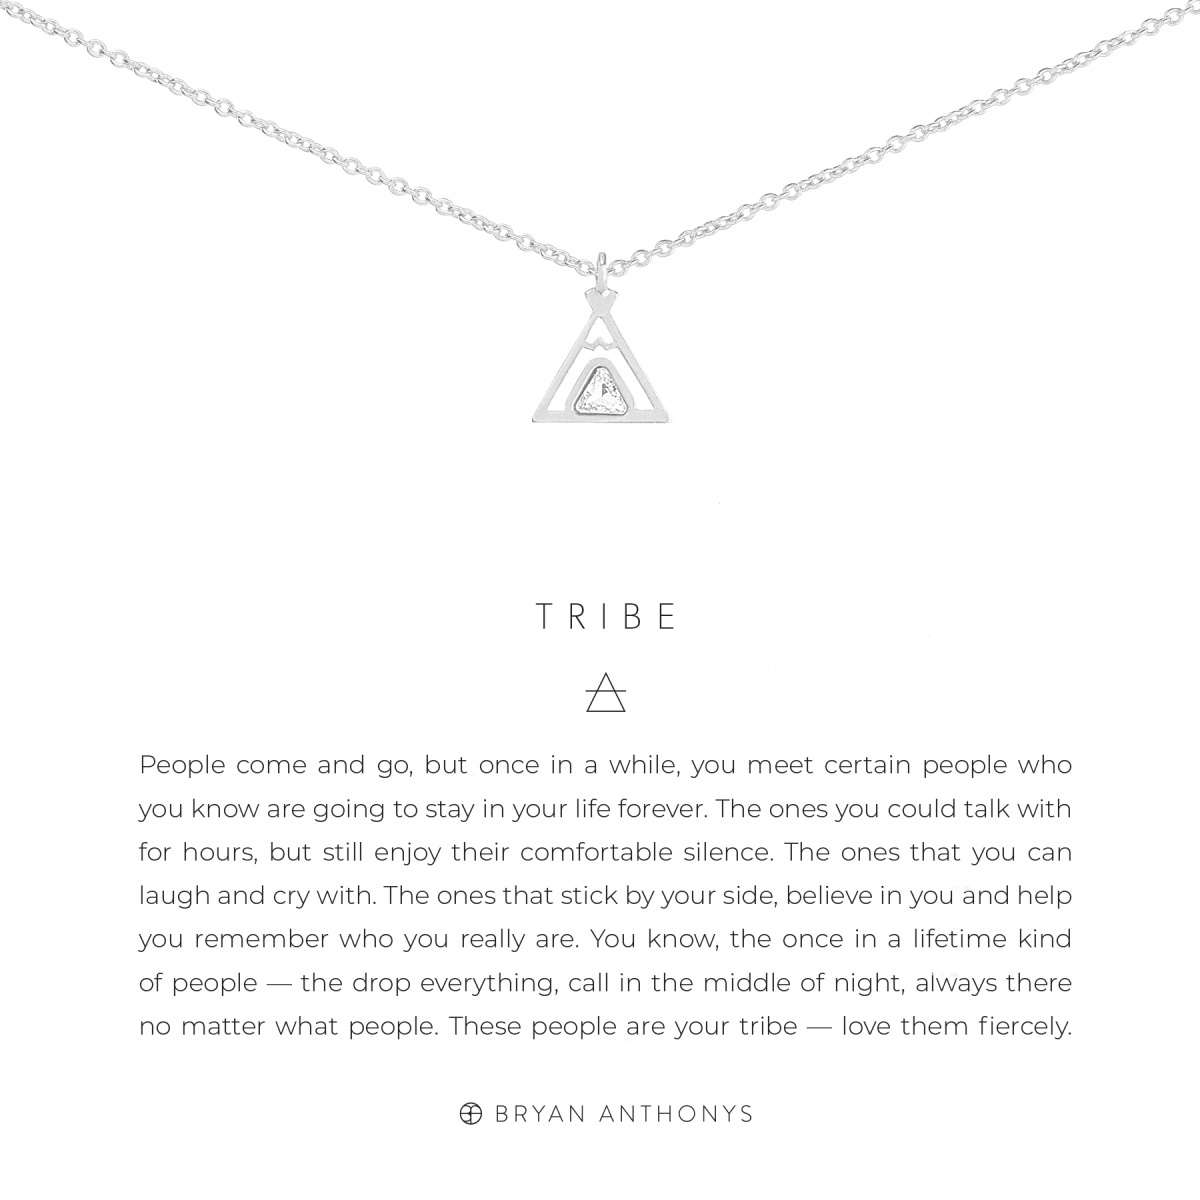 Bryan Anthonys Bryan Anthonys Tribe Friendship Necklace